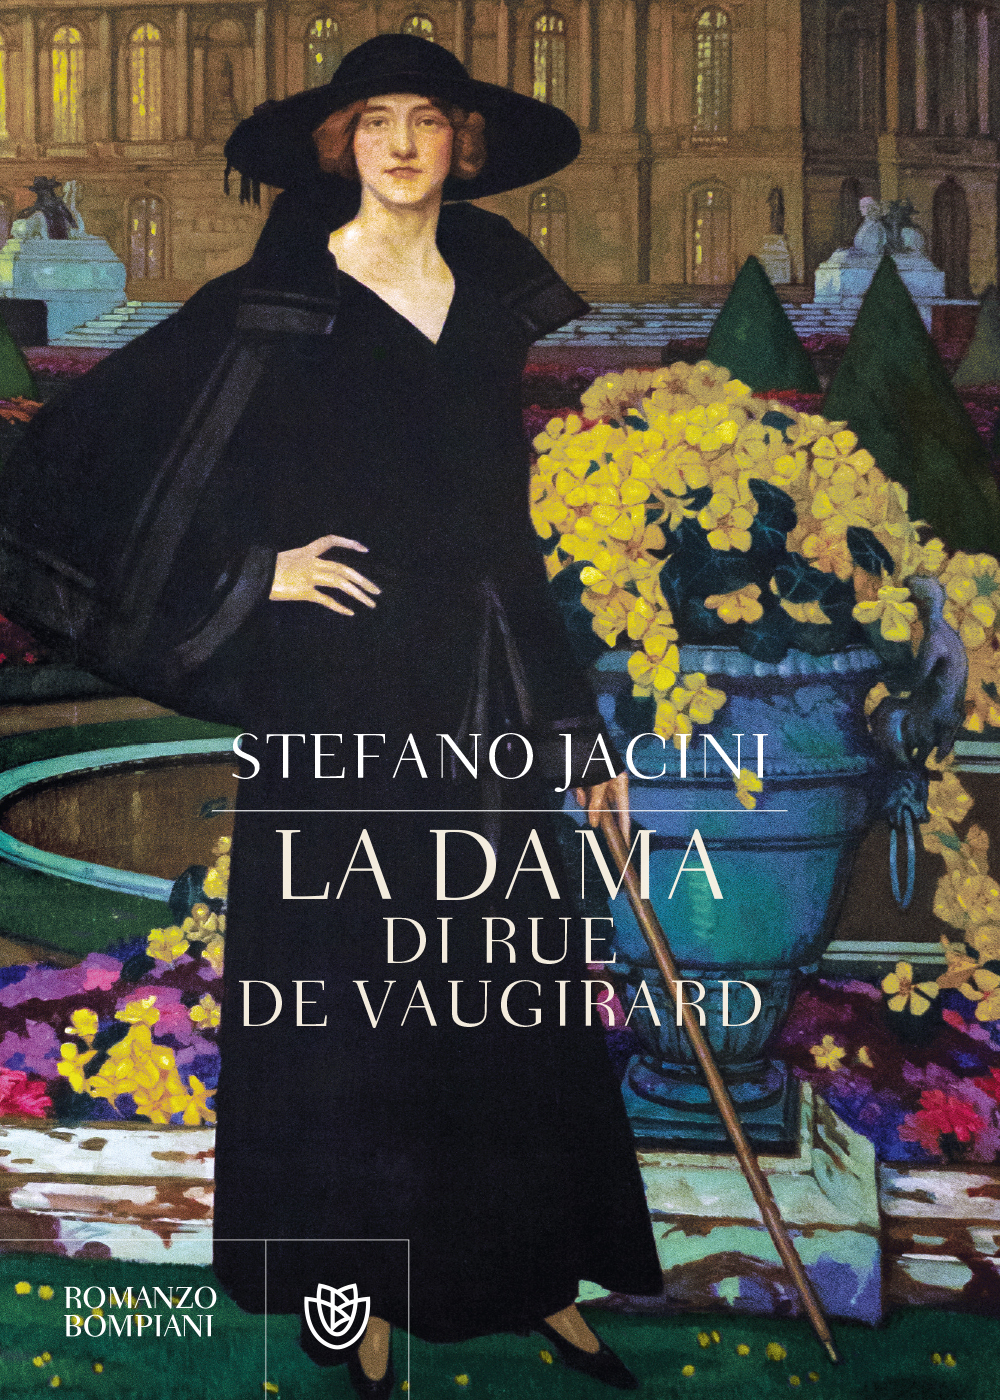 La dama di Rue de Vaugirard